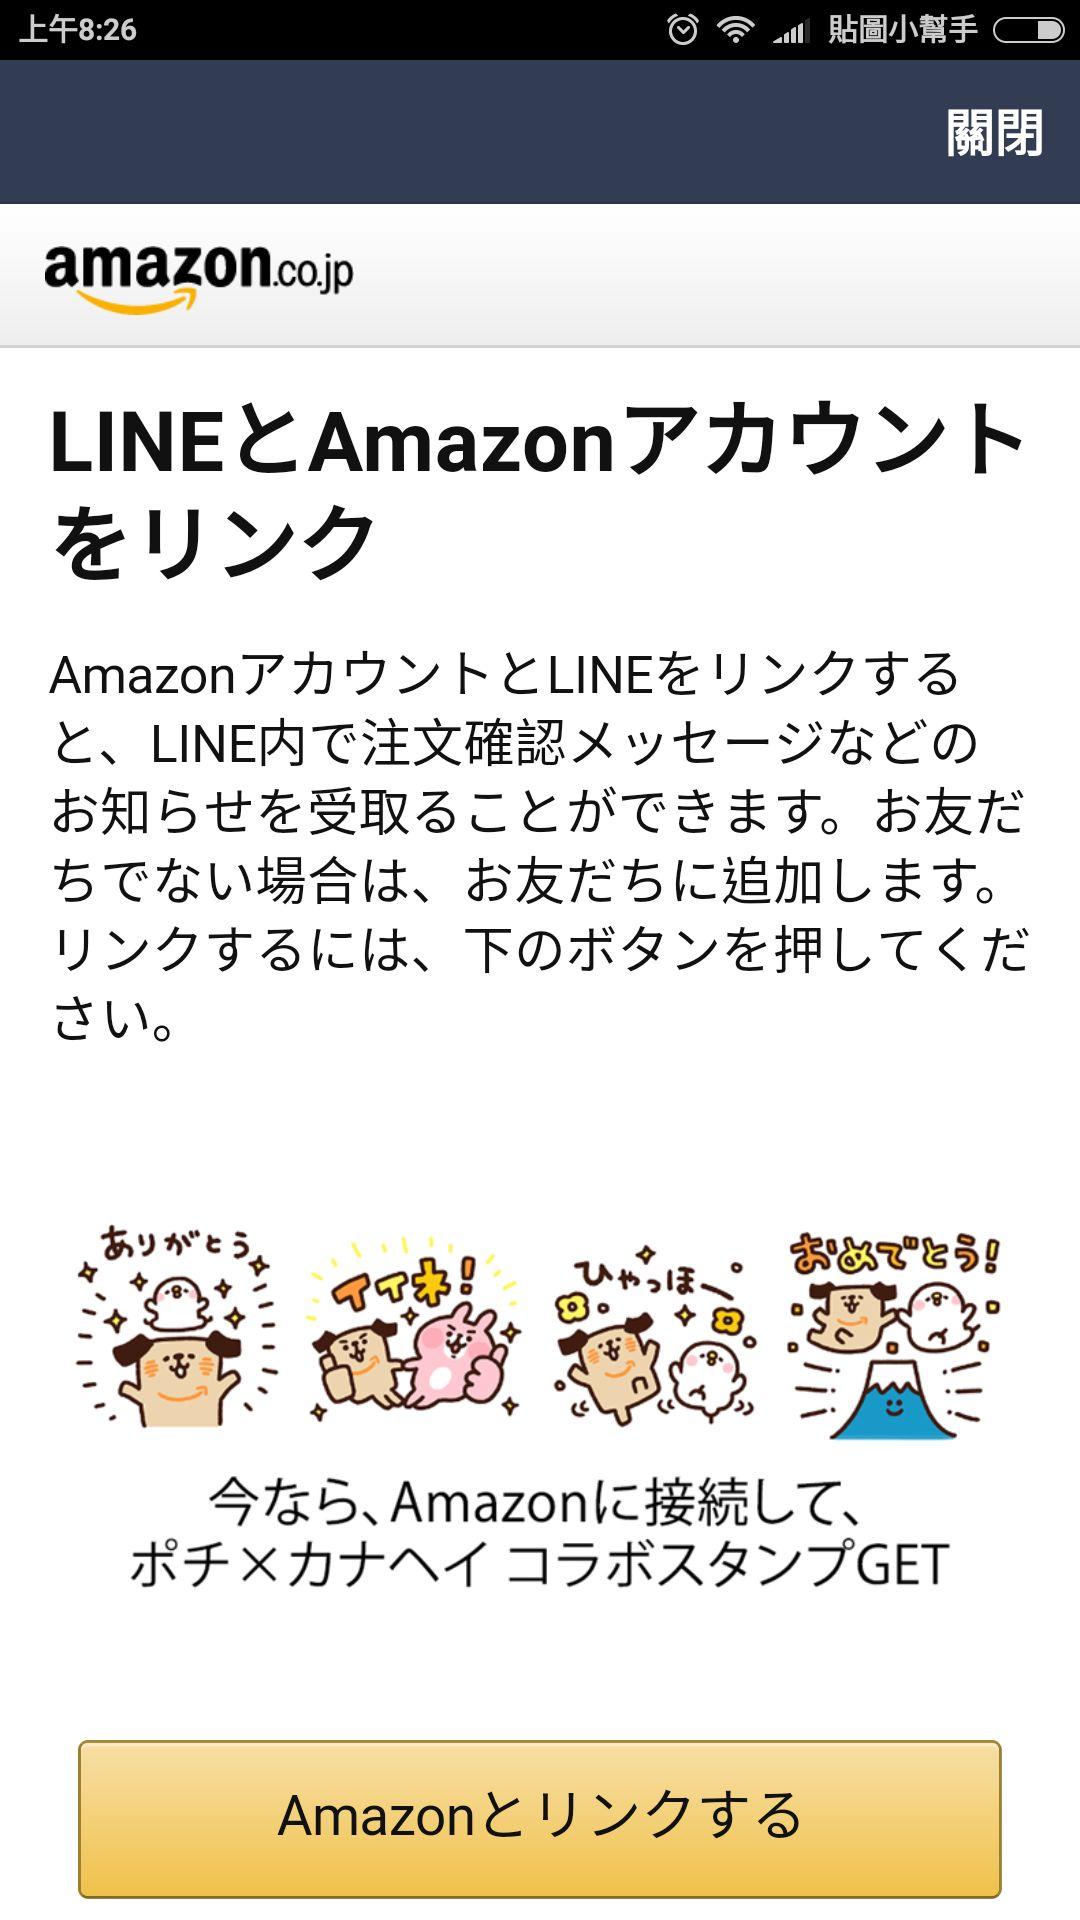 screenshot_2016-12-07-08-26-41-071_jp-naver-line-android_result